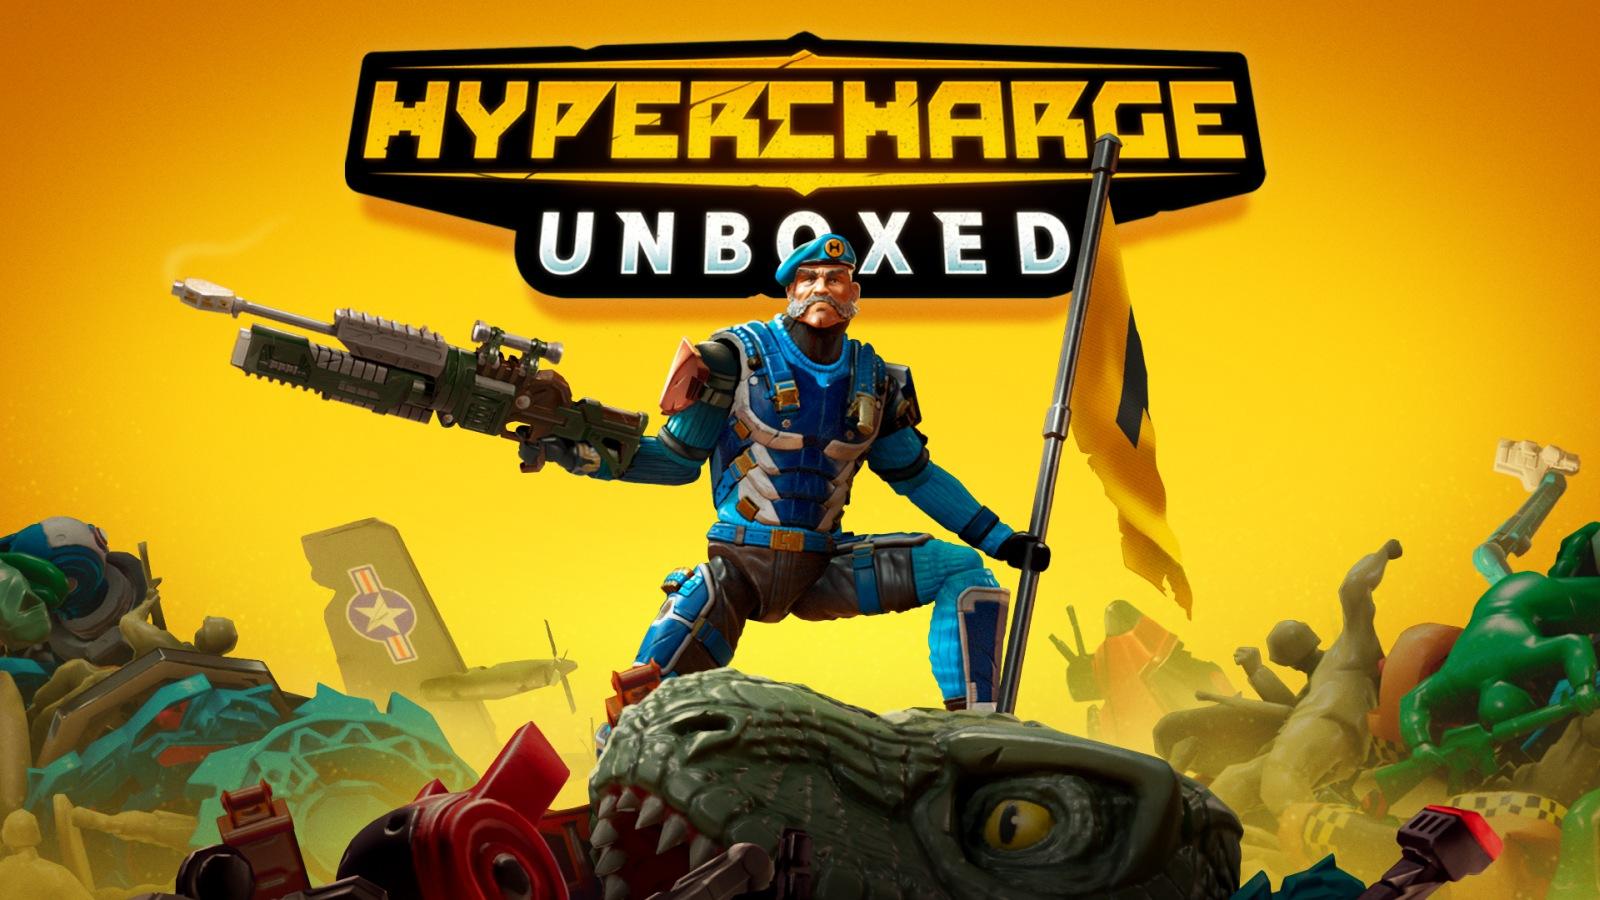 Hypercharge: Unboxed | Digital Cybercherries